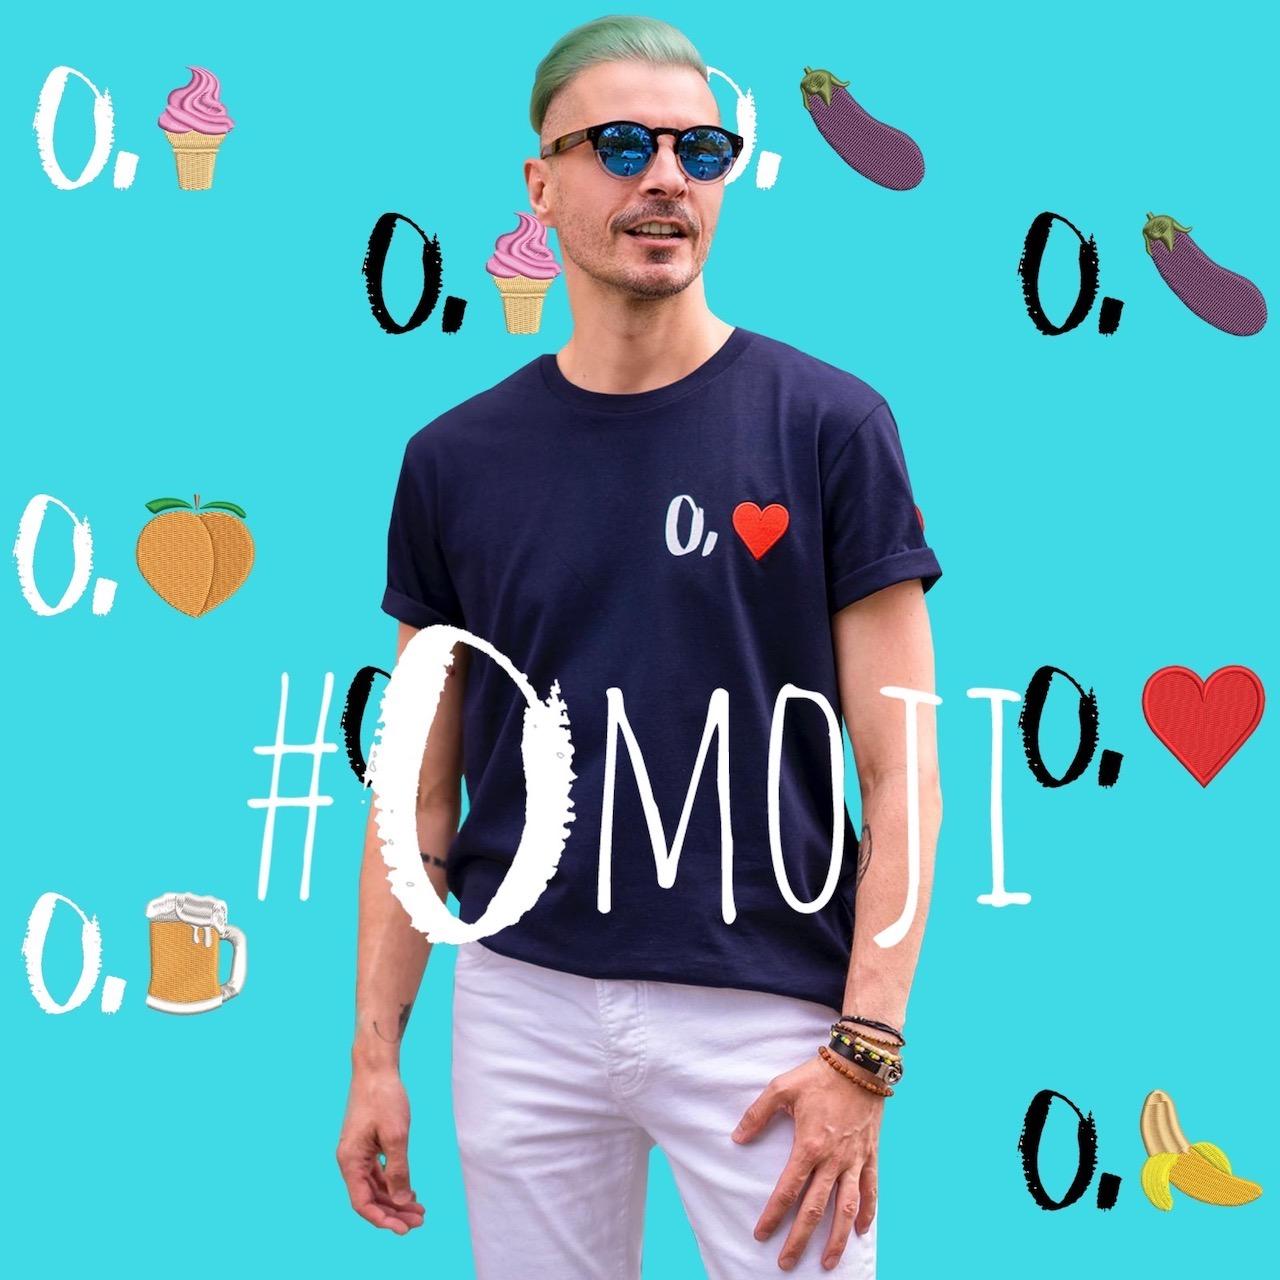 #Omoji challenge profile